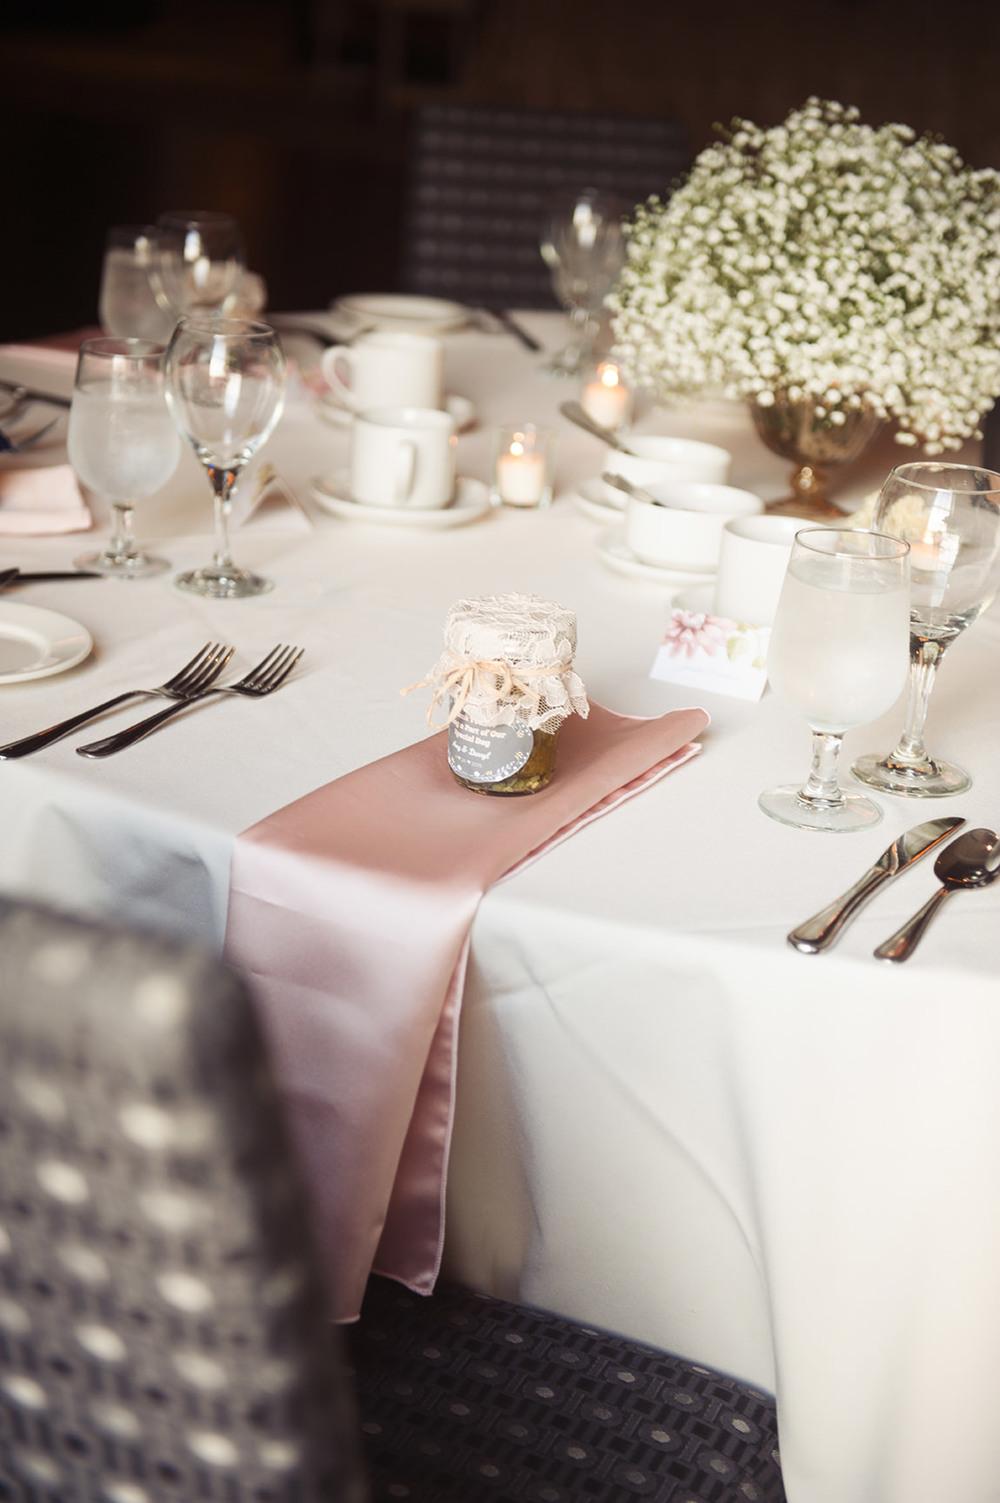 St-Catharines-Wedding-Stone-Mill-Inn-Amy-Darryl-photography-by-Morgan-Falk-059.JPG